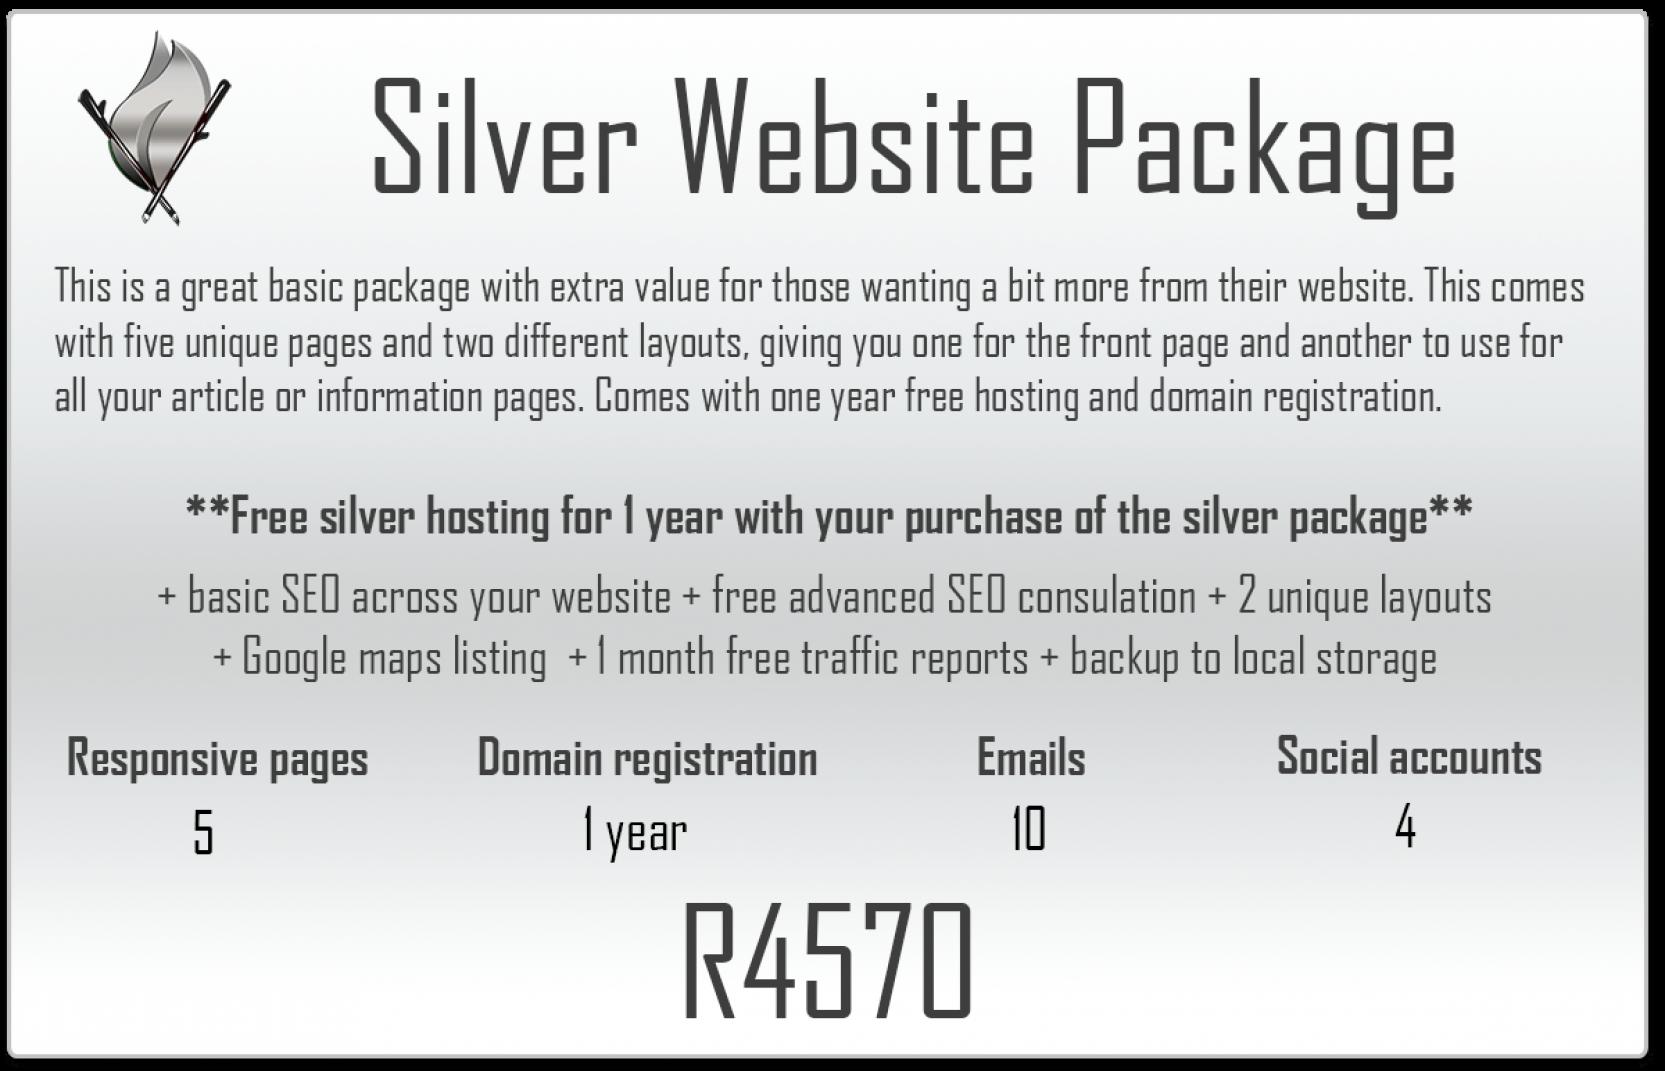 Silver website package